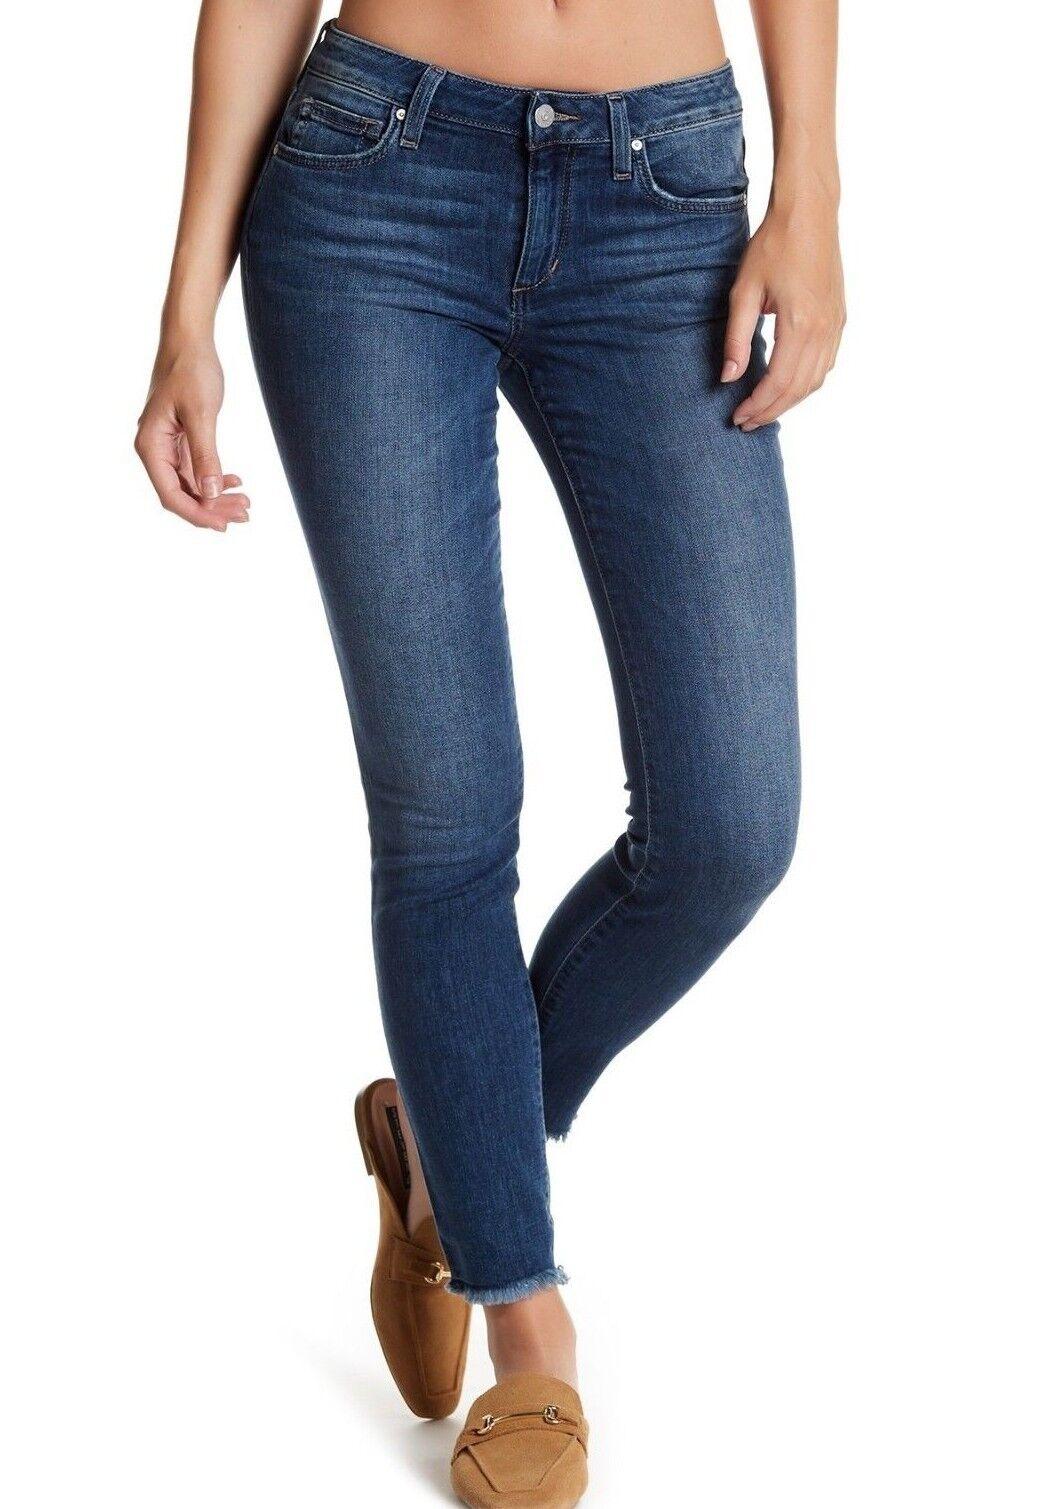 Nwt JOE´S Sz25 die Eng Anliegende Knöchel Roh Saum Jeans Stretch